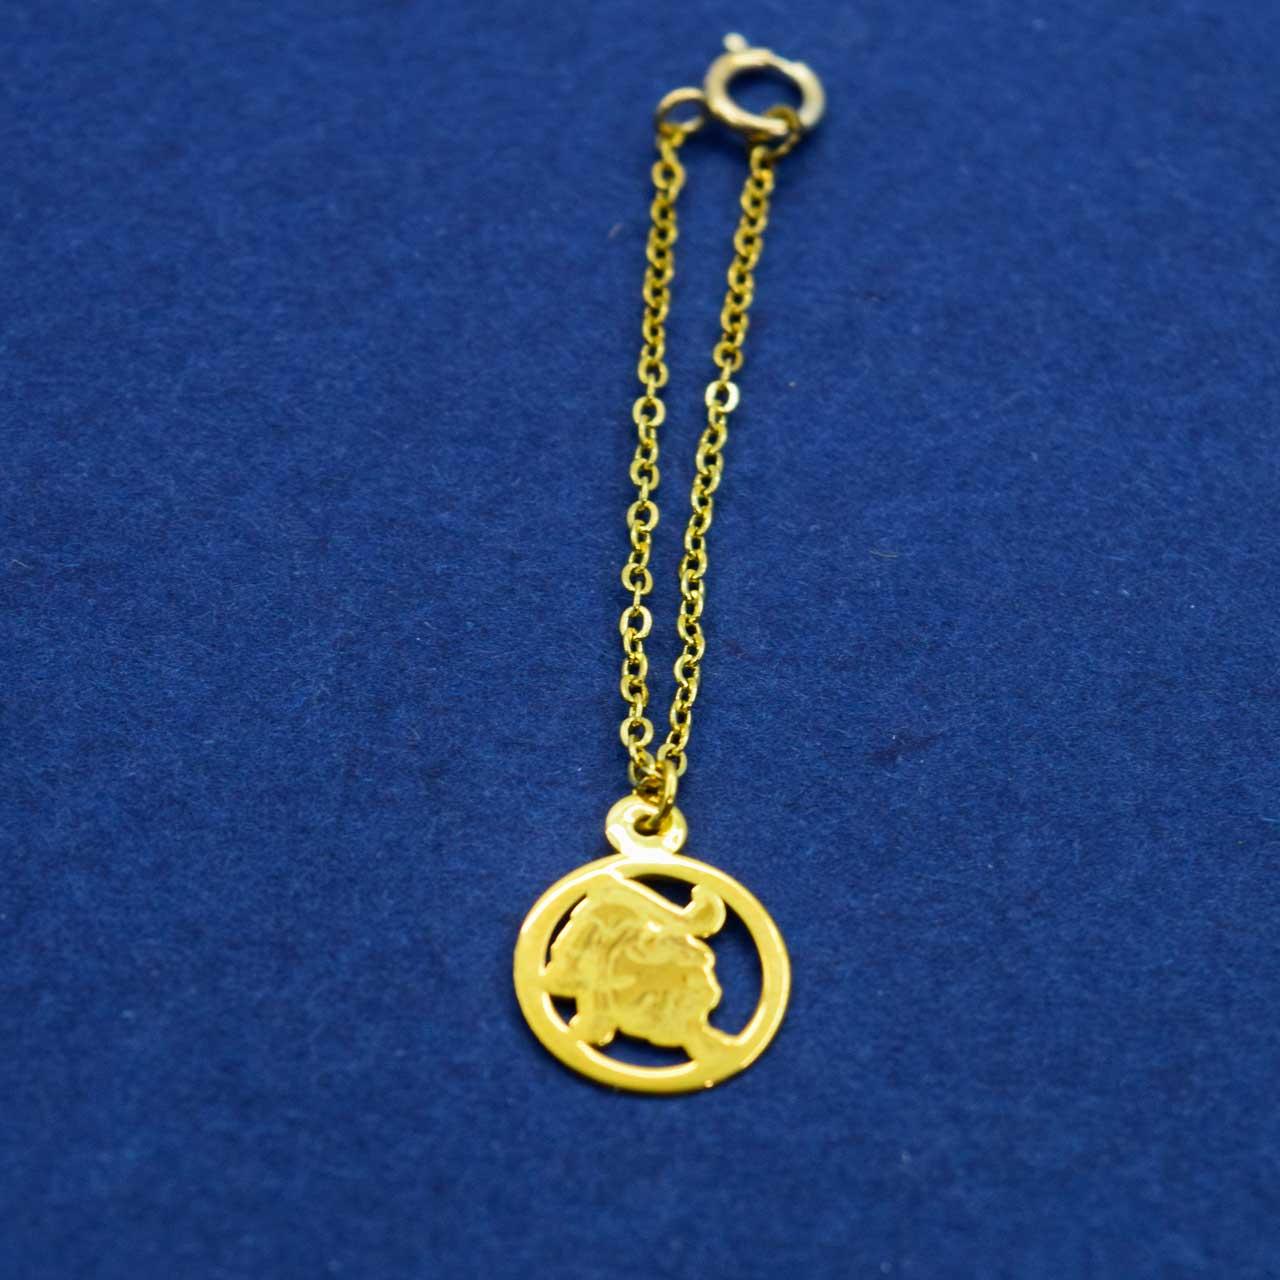 آویز ساعت طلا 18 عیار زنانه کانیار گالری مدل AS90